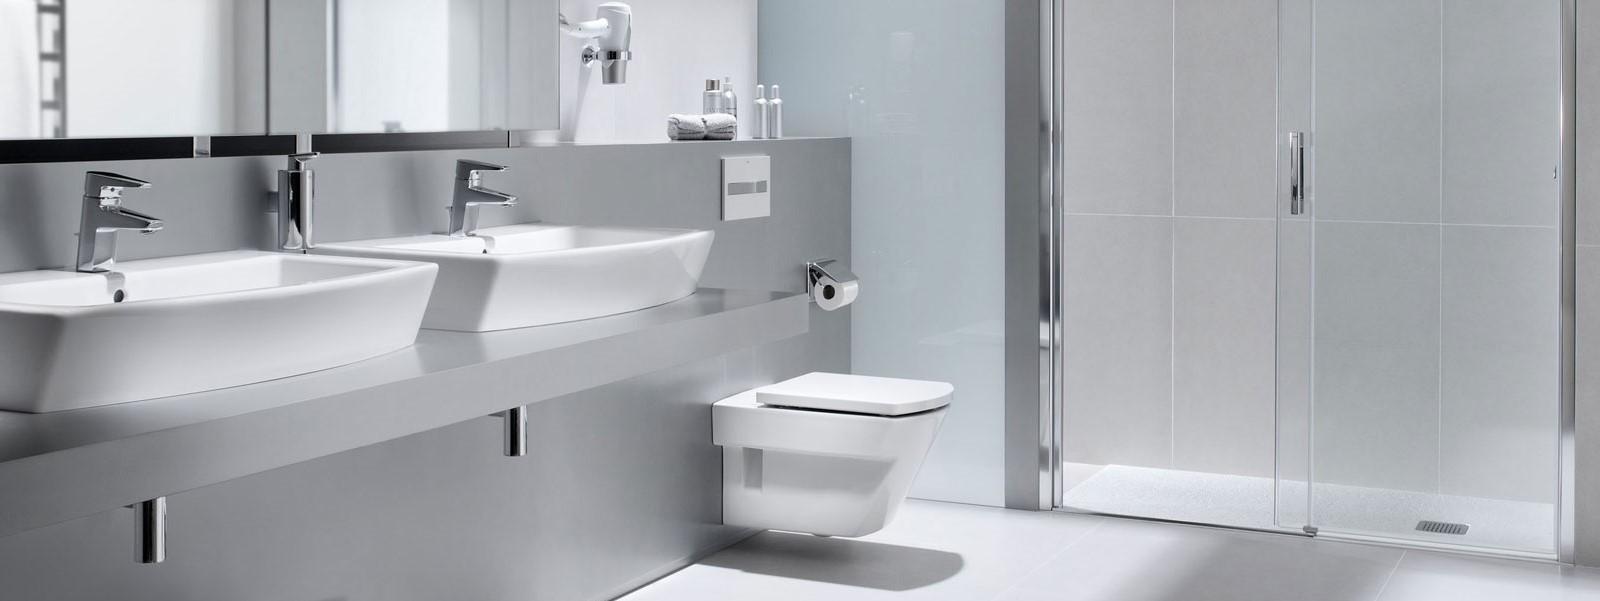 Siena Bathroom fittings